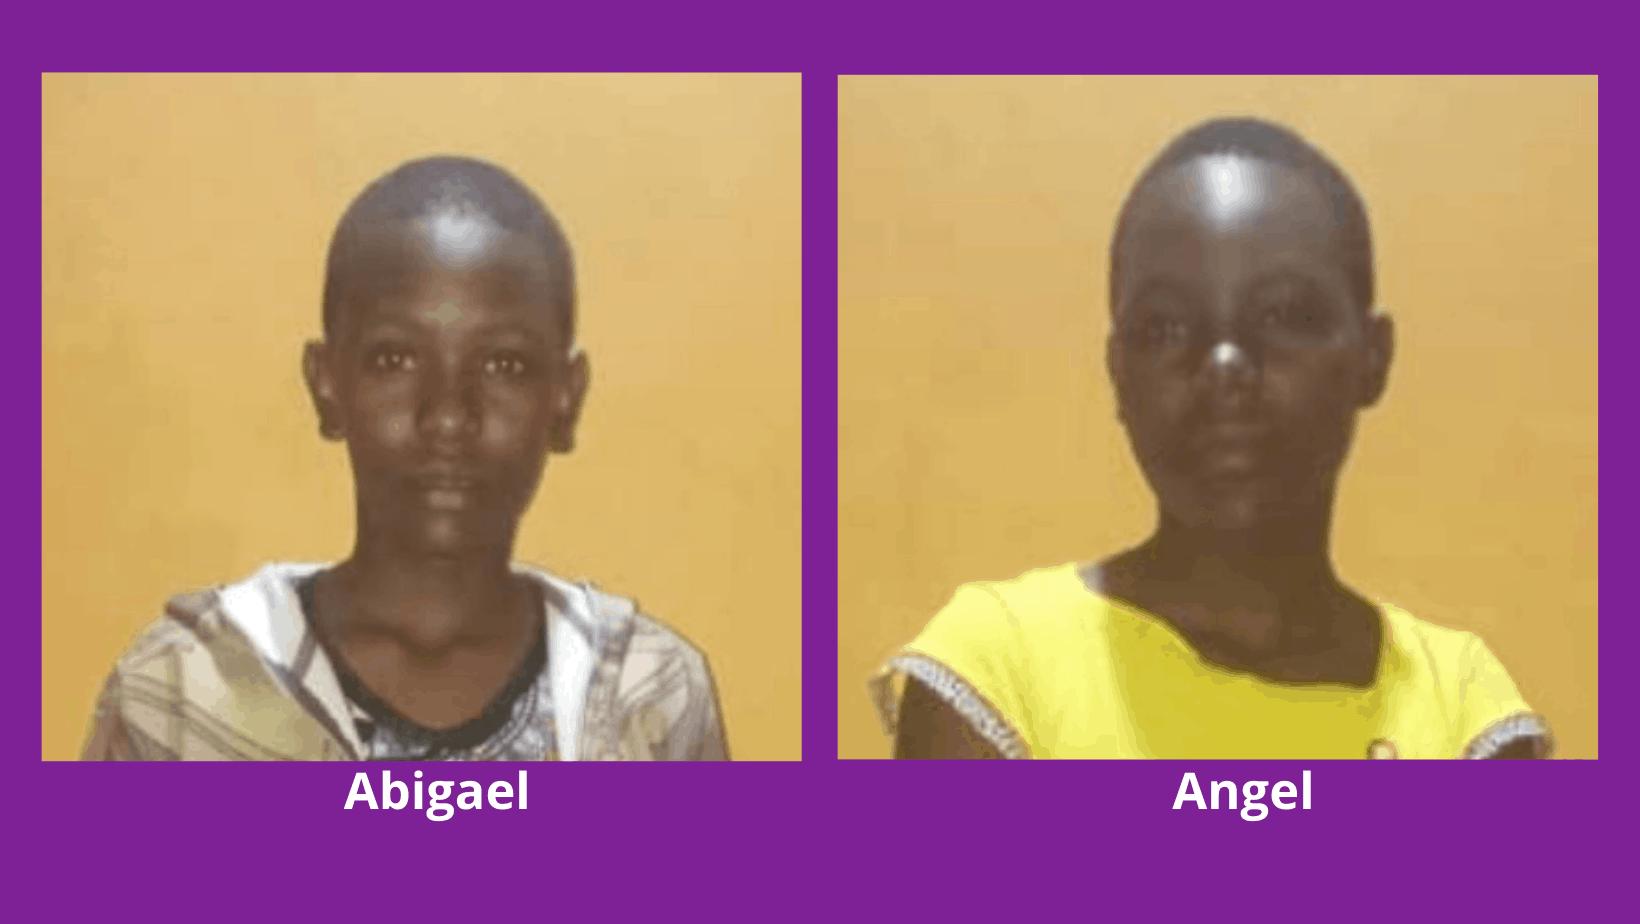 Abigael and Angel